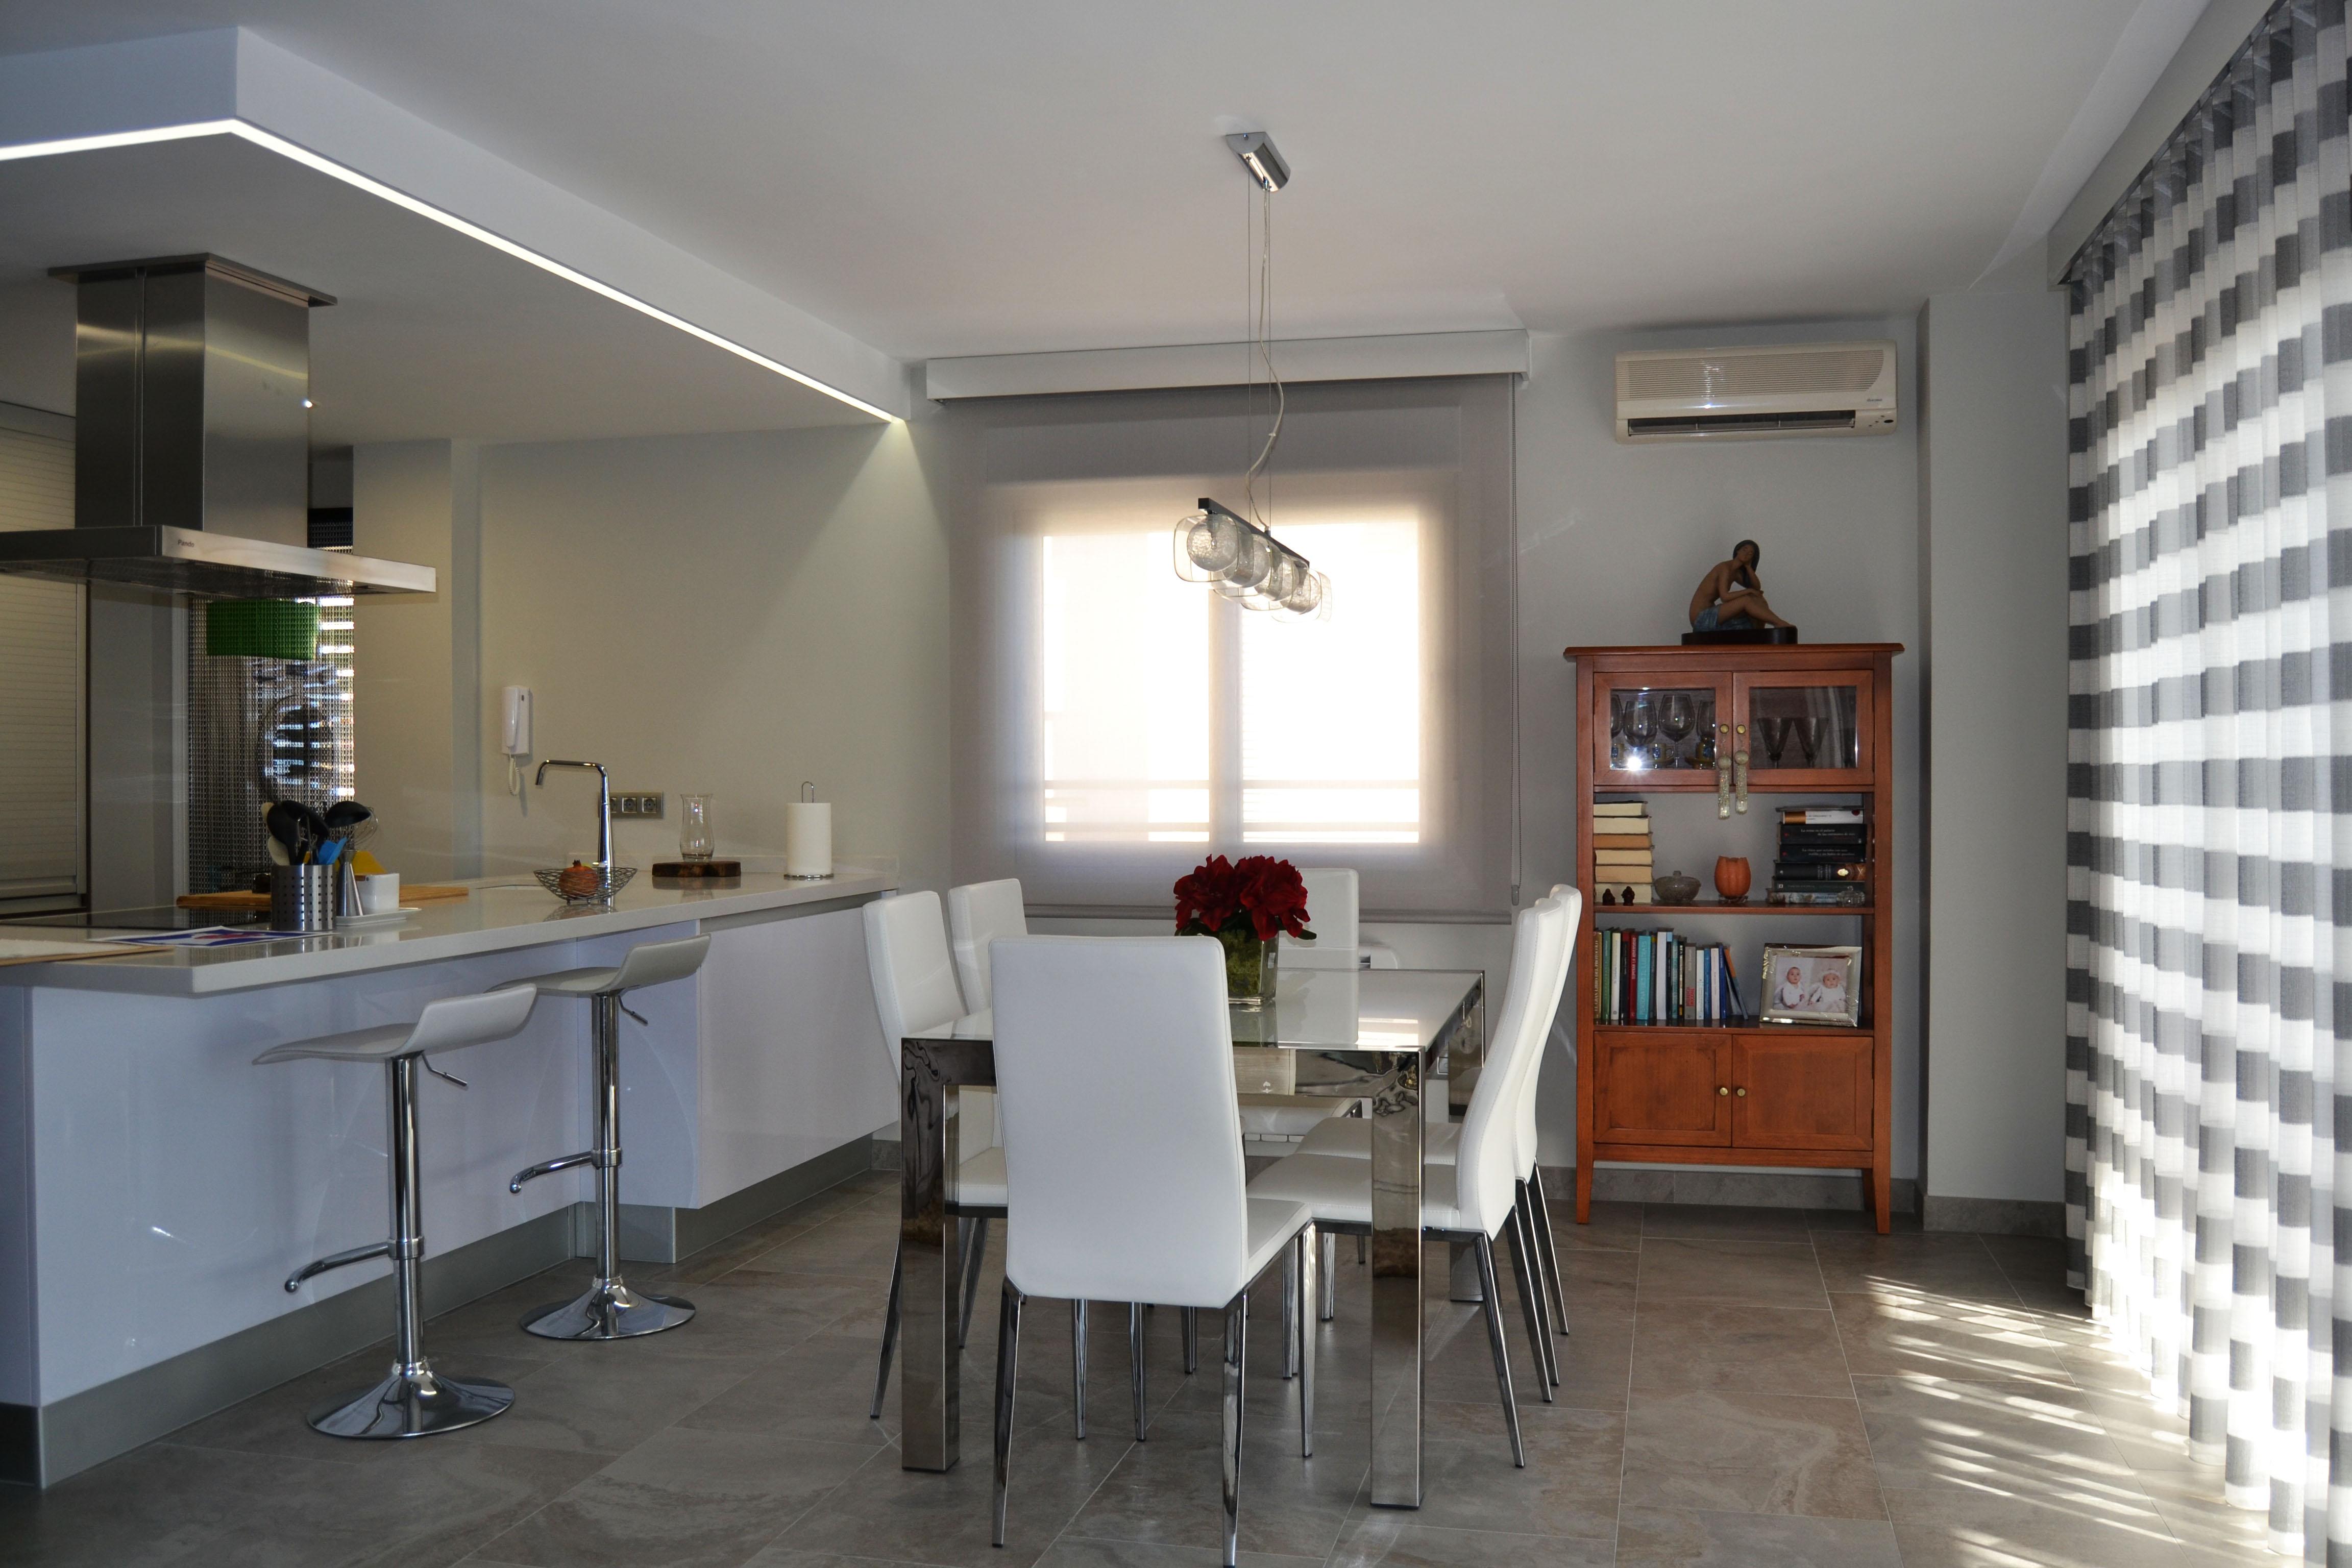 Un sal n moderno con vistas al mar villalba interiorismo - Pintar un salon comedor ...